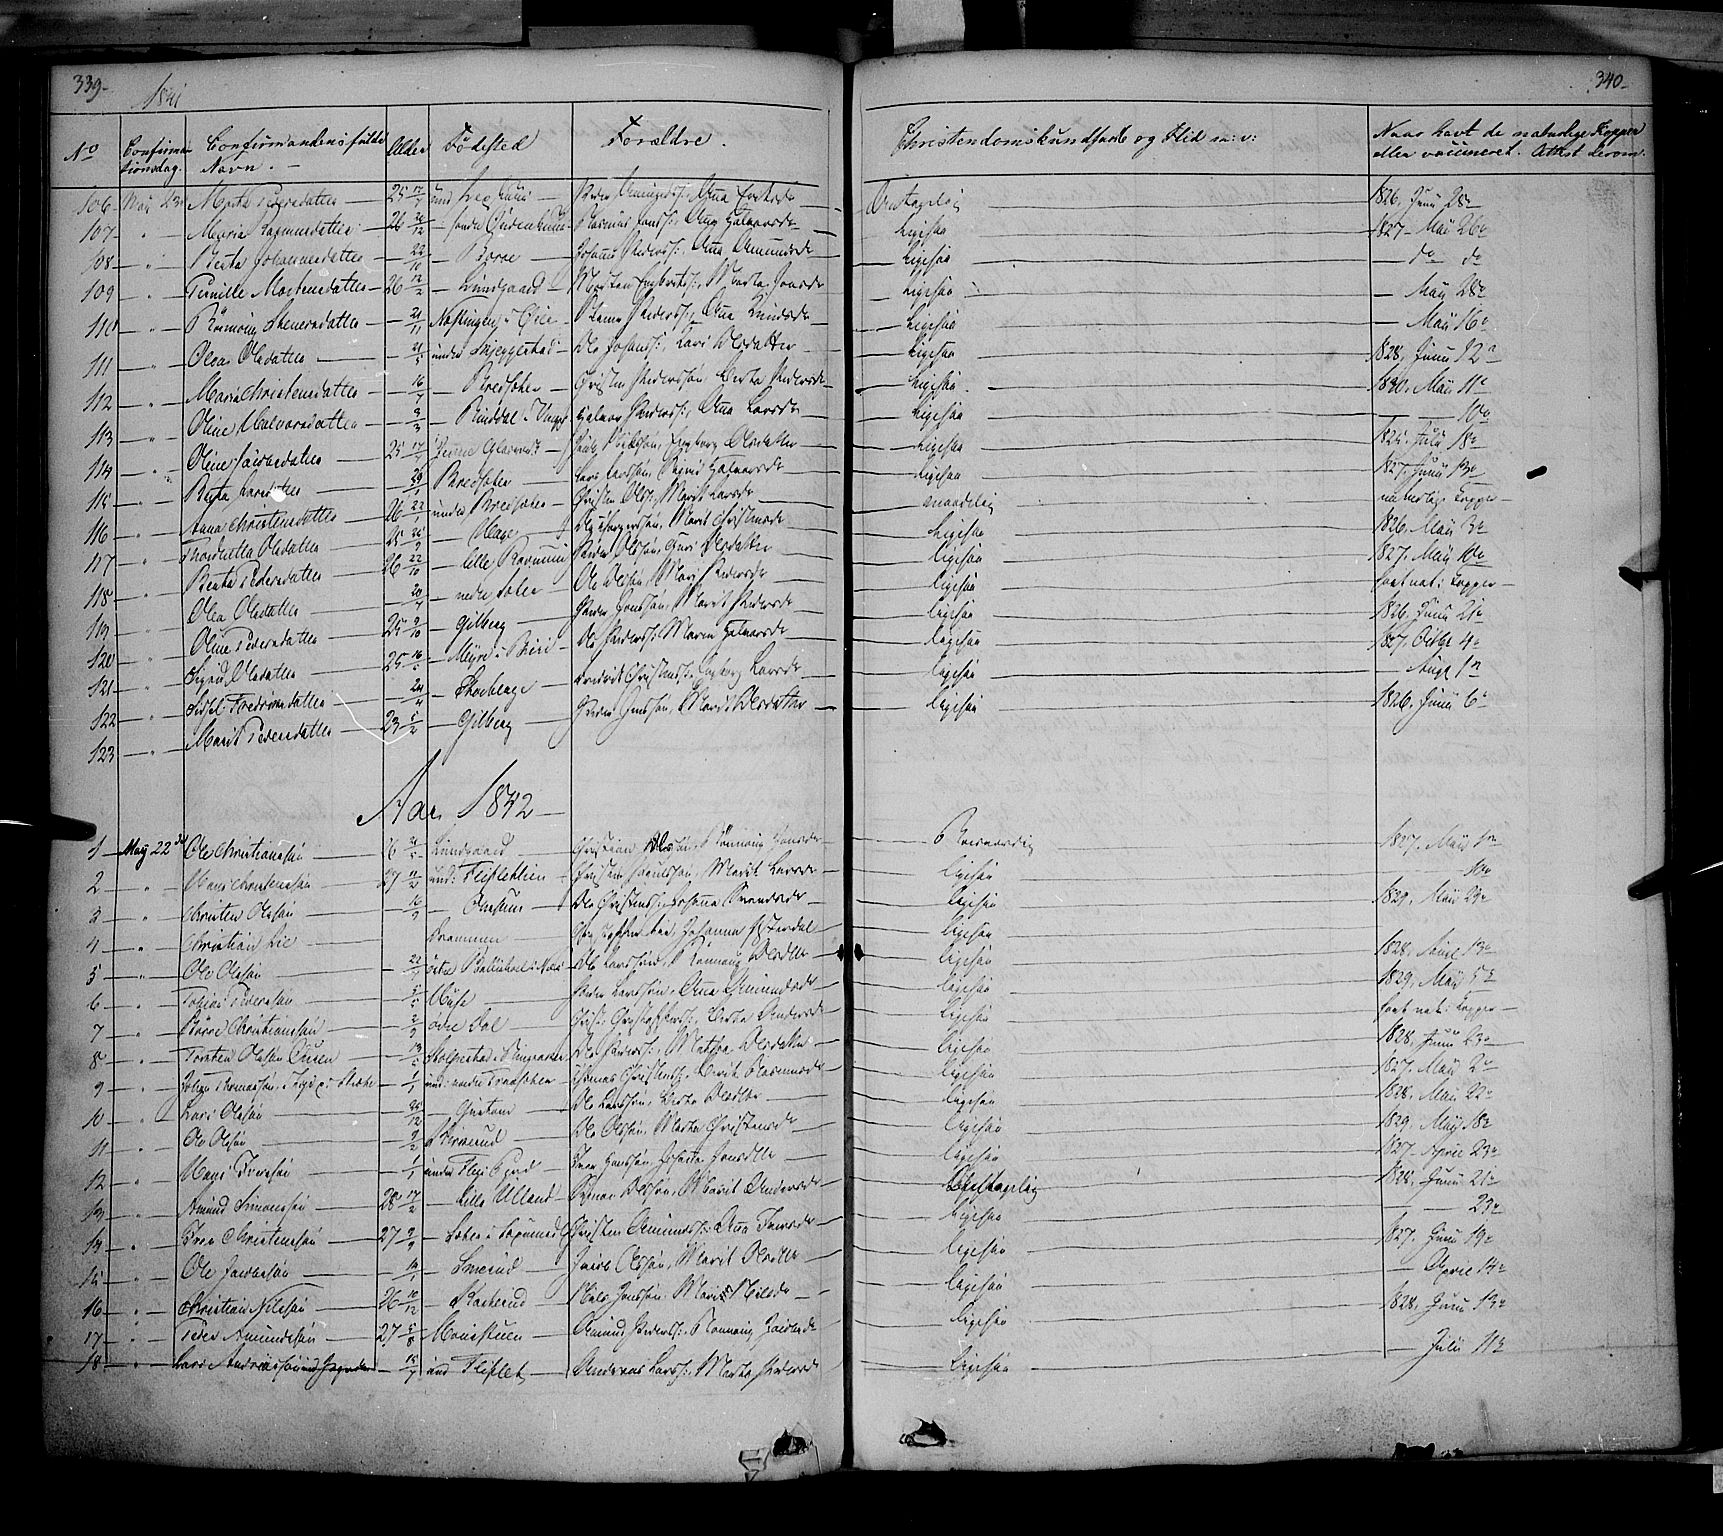 SAH, Fåberg prestekontor, Parish register (official) no. 5, 1836-1854, p. 339-340